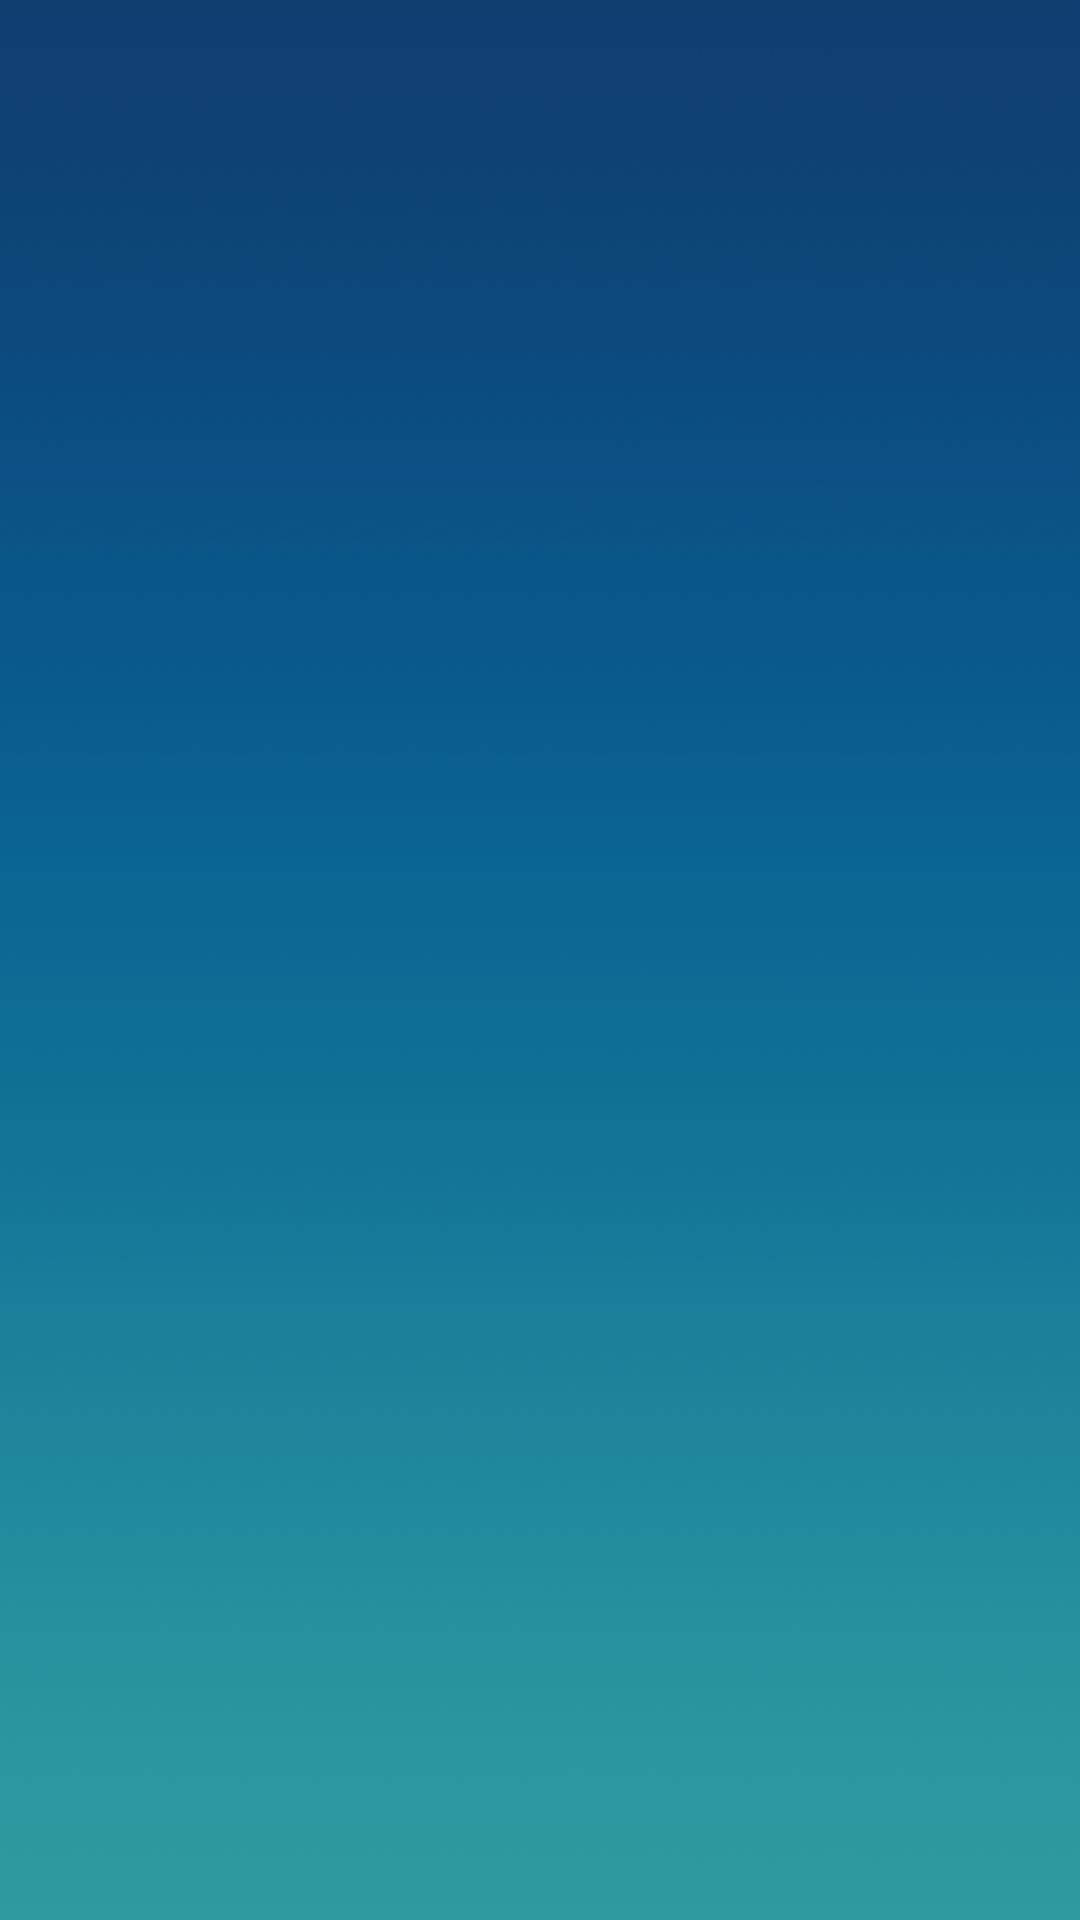 Unduh 1000+ Wallpaper Keren Hd Untuk Xiaomi HD